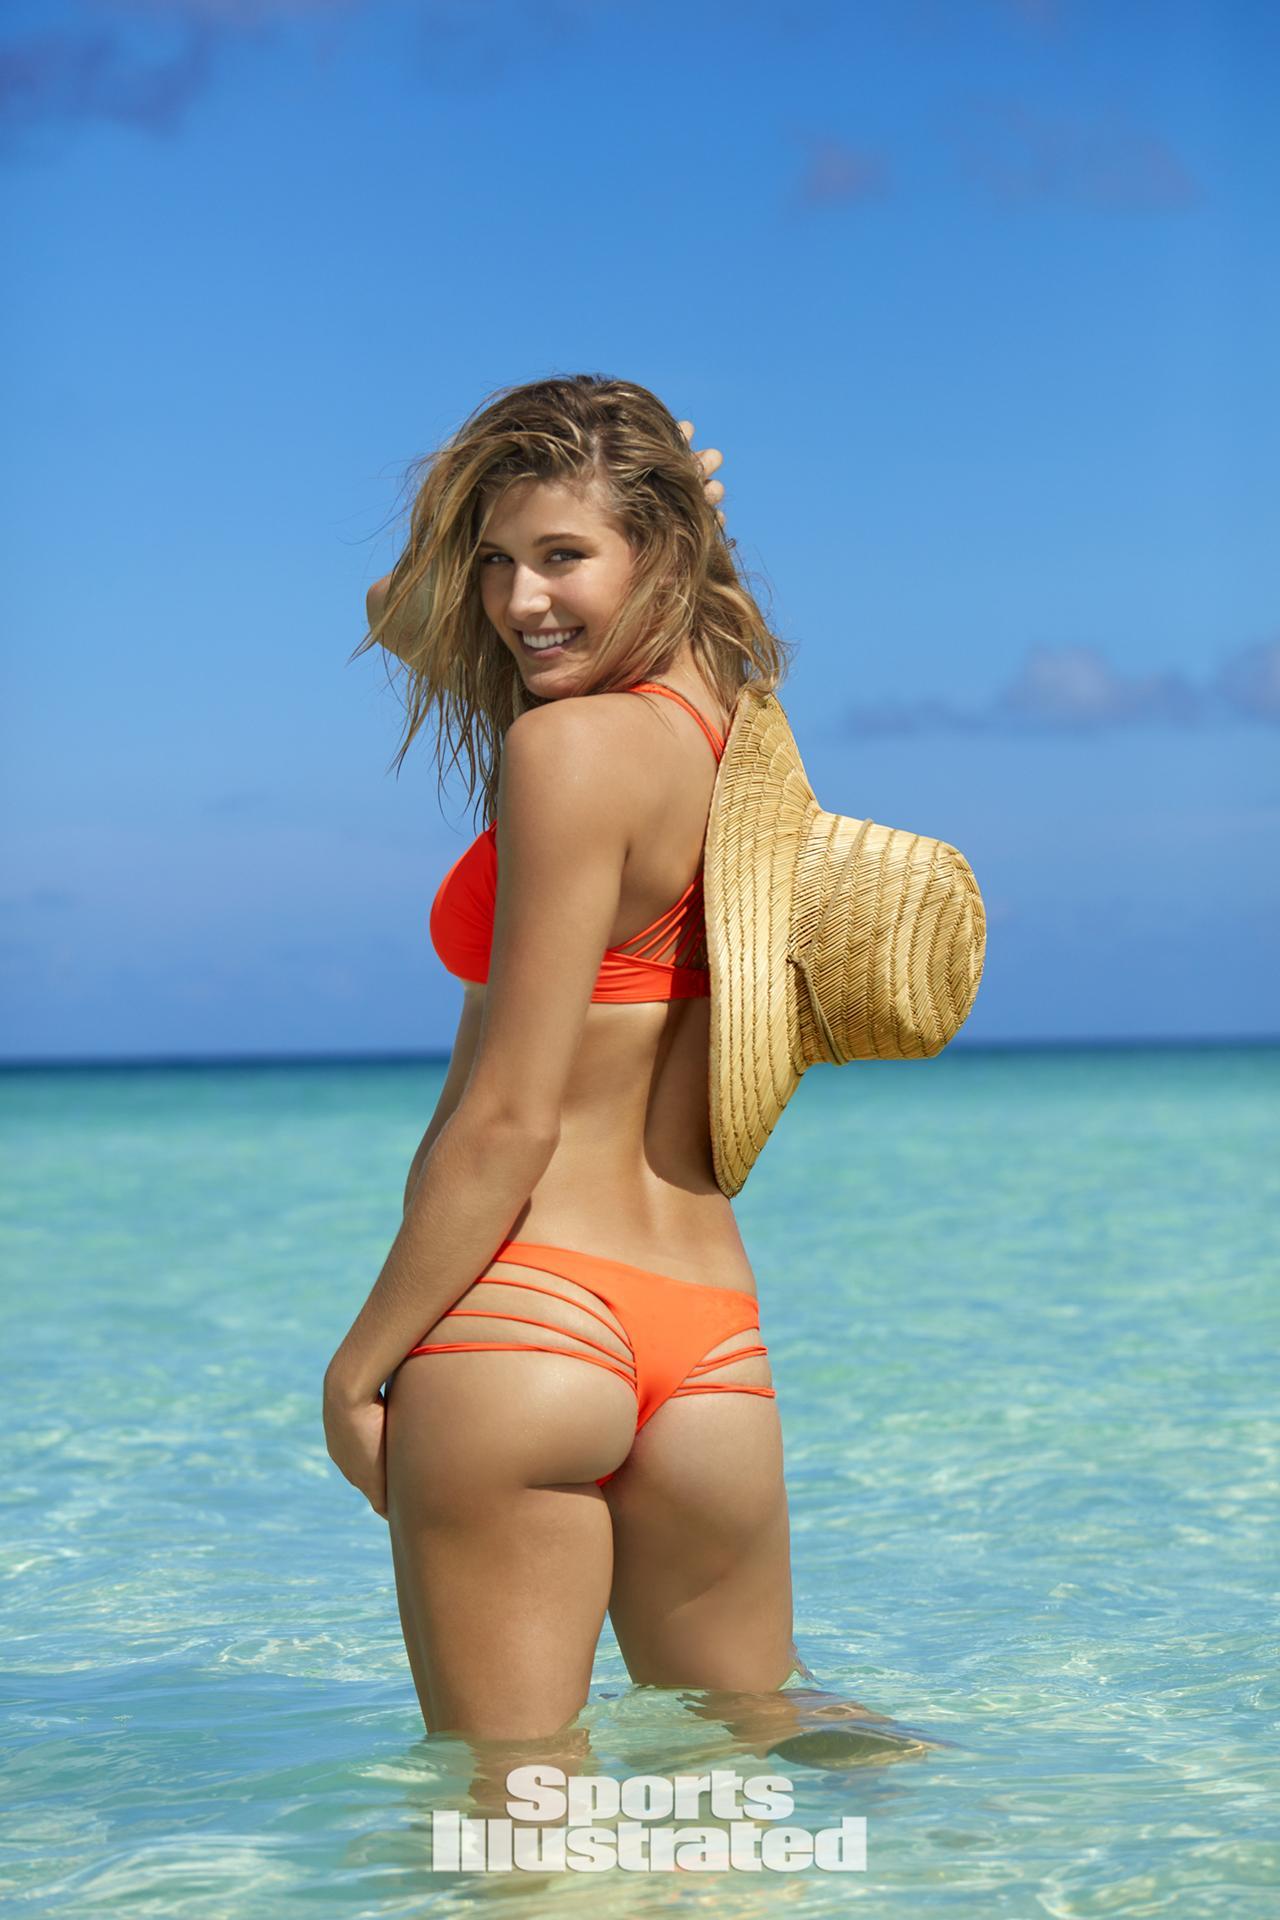 Bikini eugenie bouchard Video: Eugenie